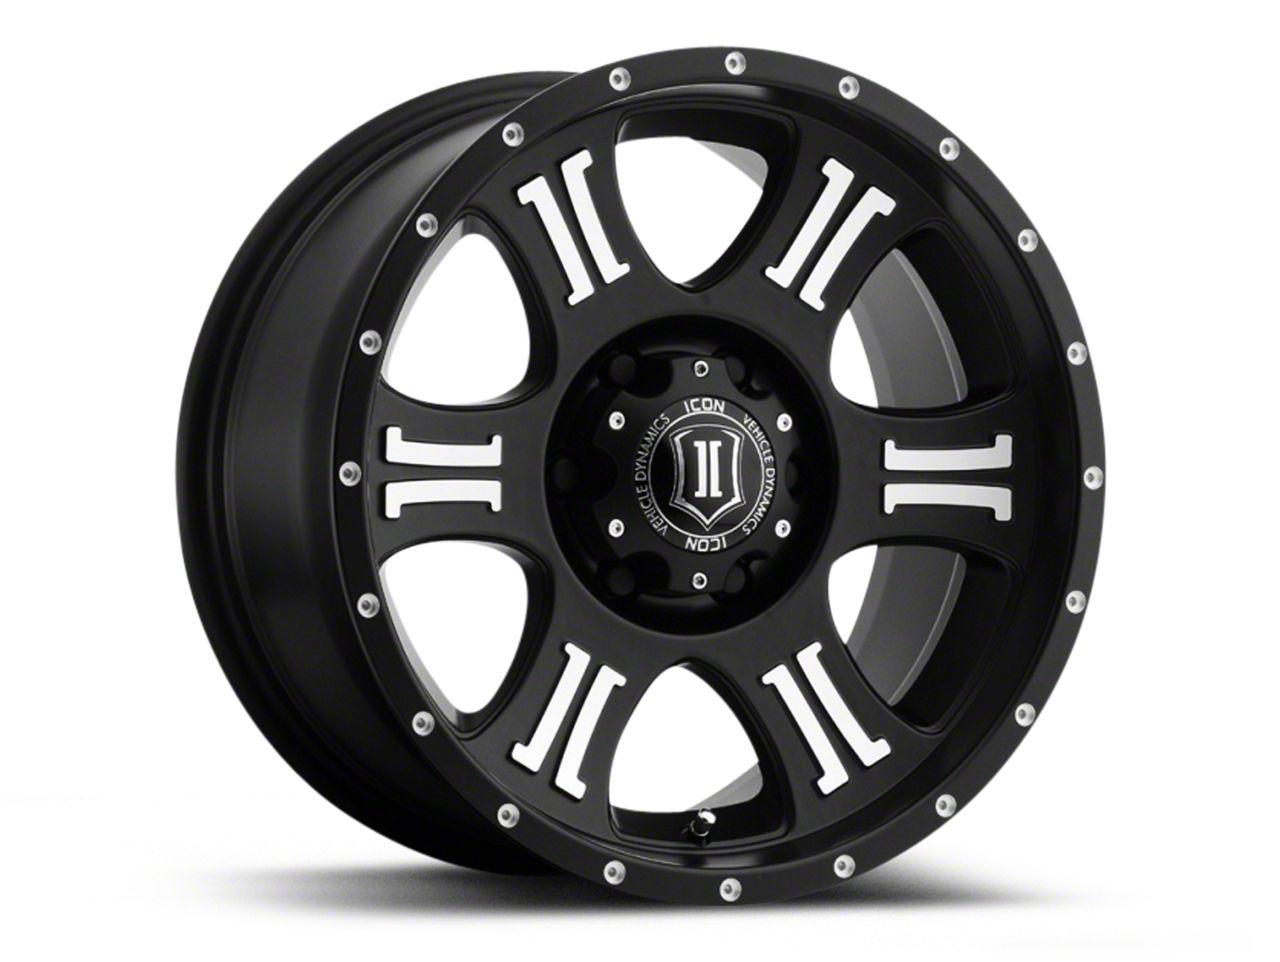 ICON Vehicle Dynamics Shield Satin Black Machined Wheel - 17x8.5 (07-18 Jeep Wrangler JK; 2018 Jeep Wrangler JL)